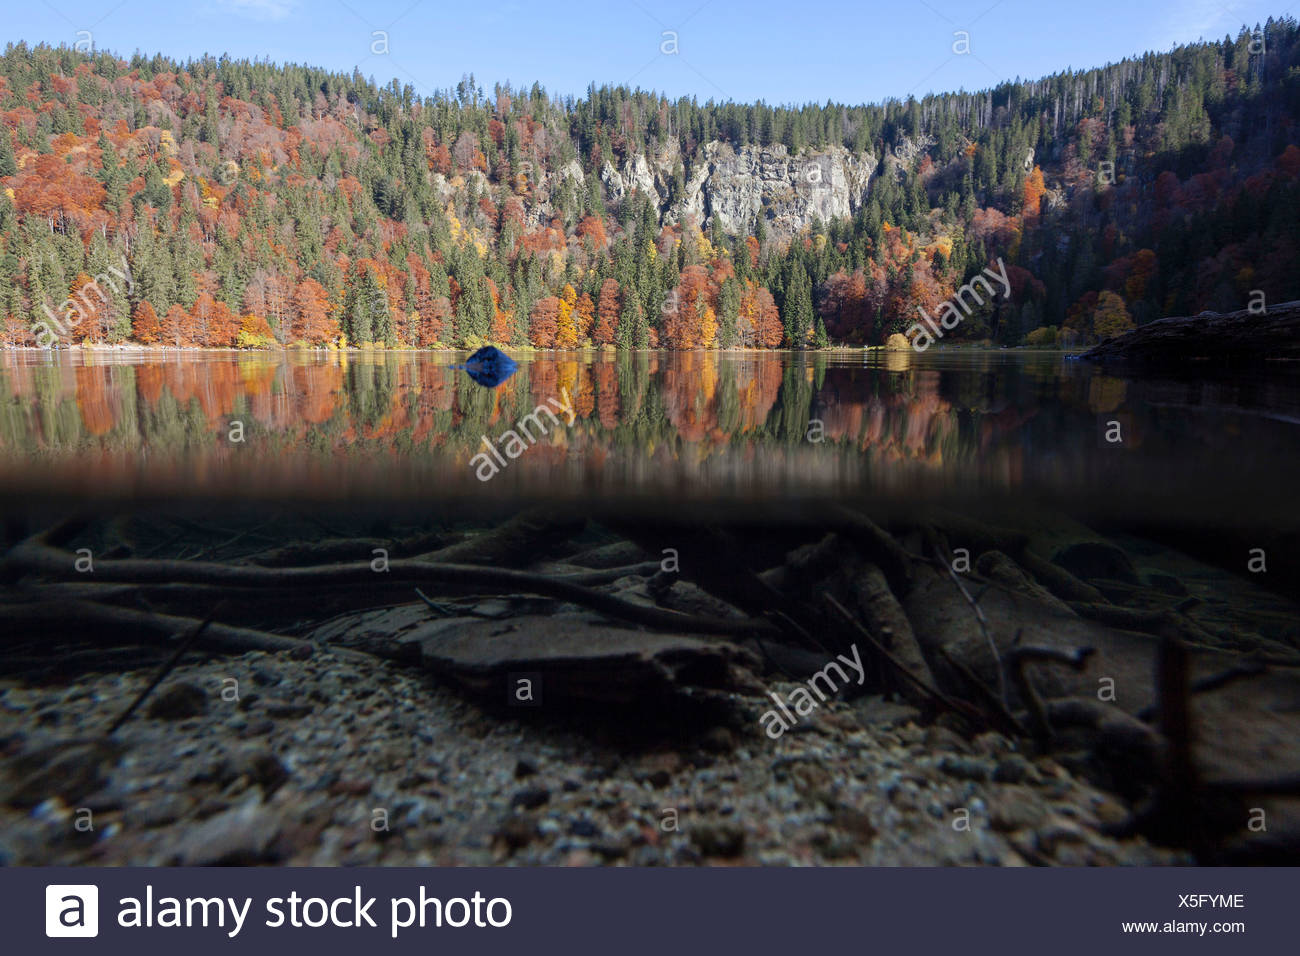 Over-under shot del Lago Feldsee en la Selva Negra, Baden-Wurttemberg Foto de stock